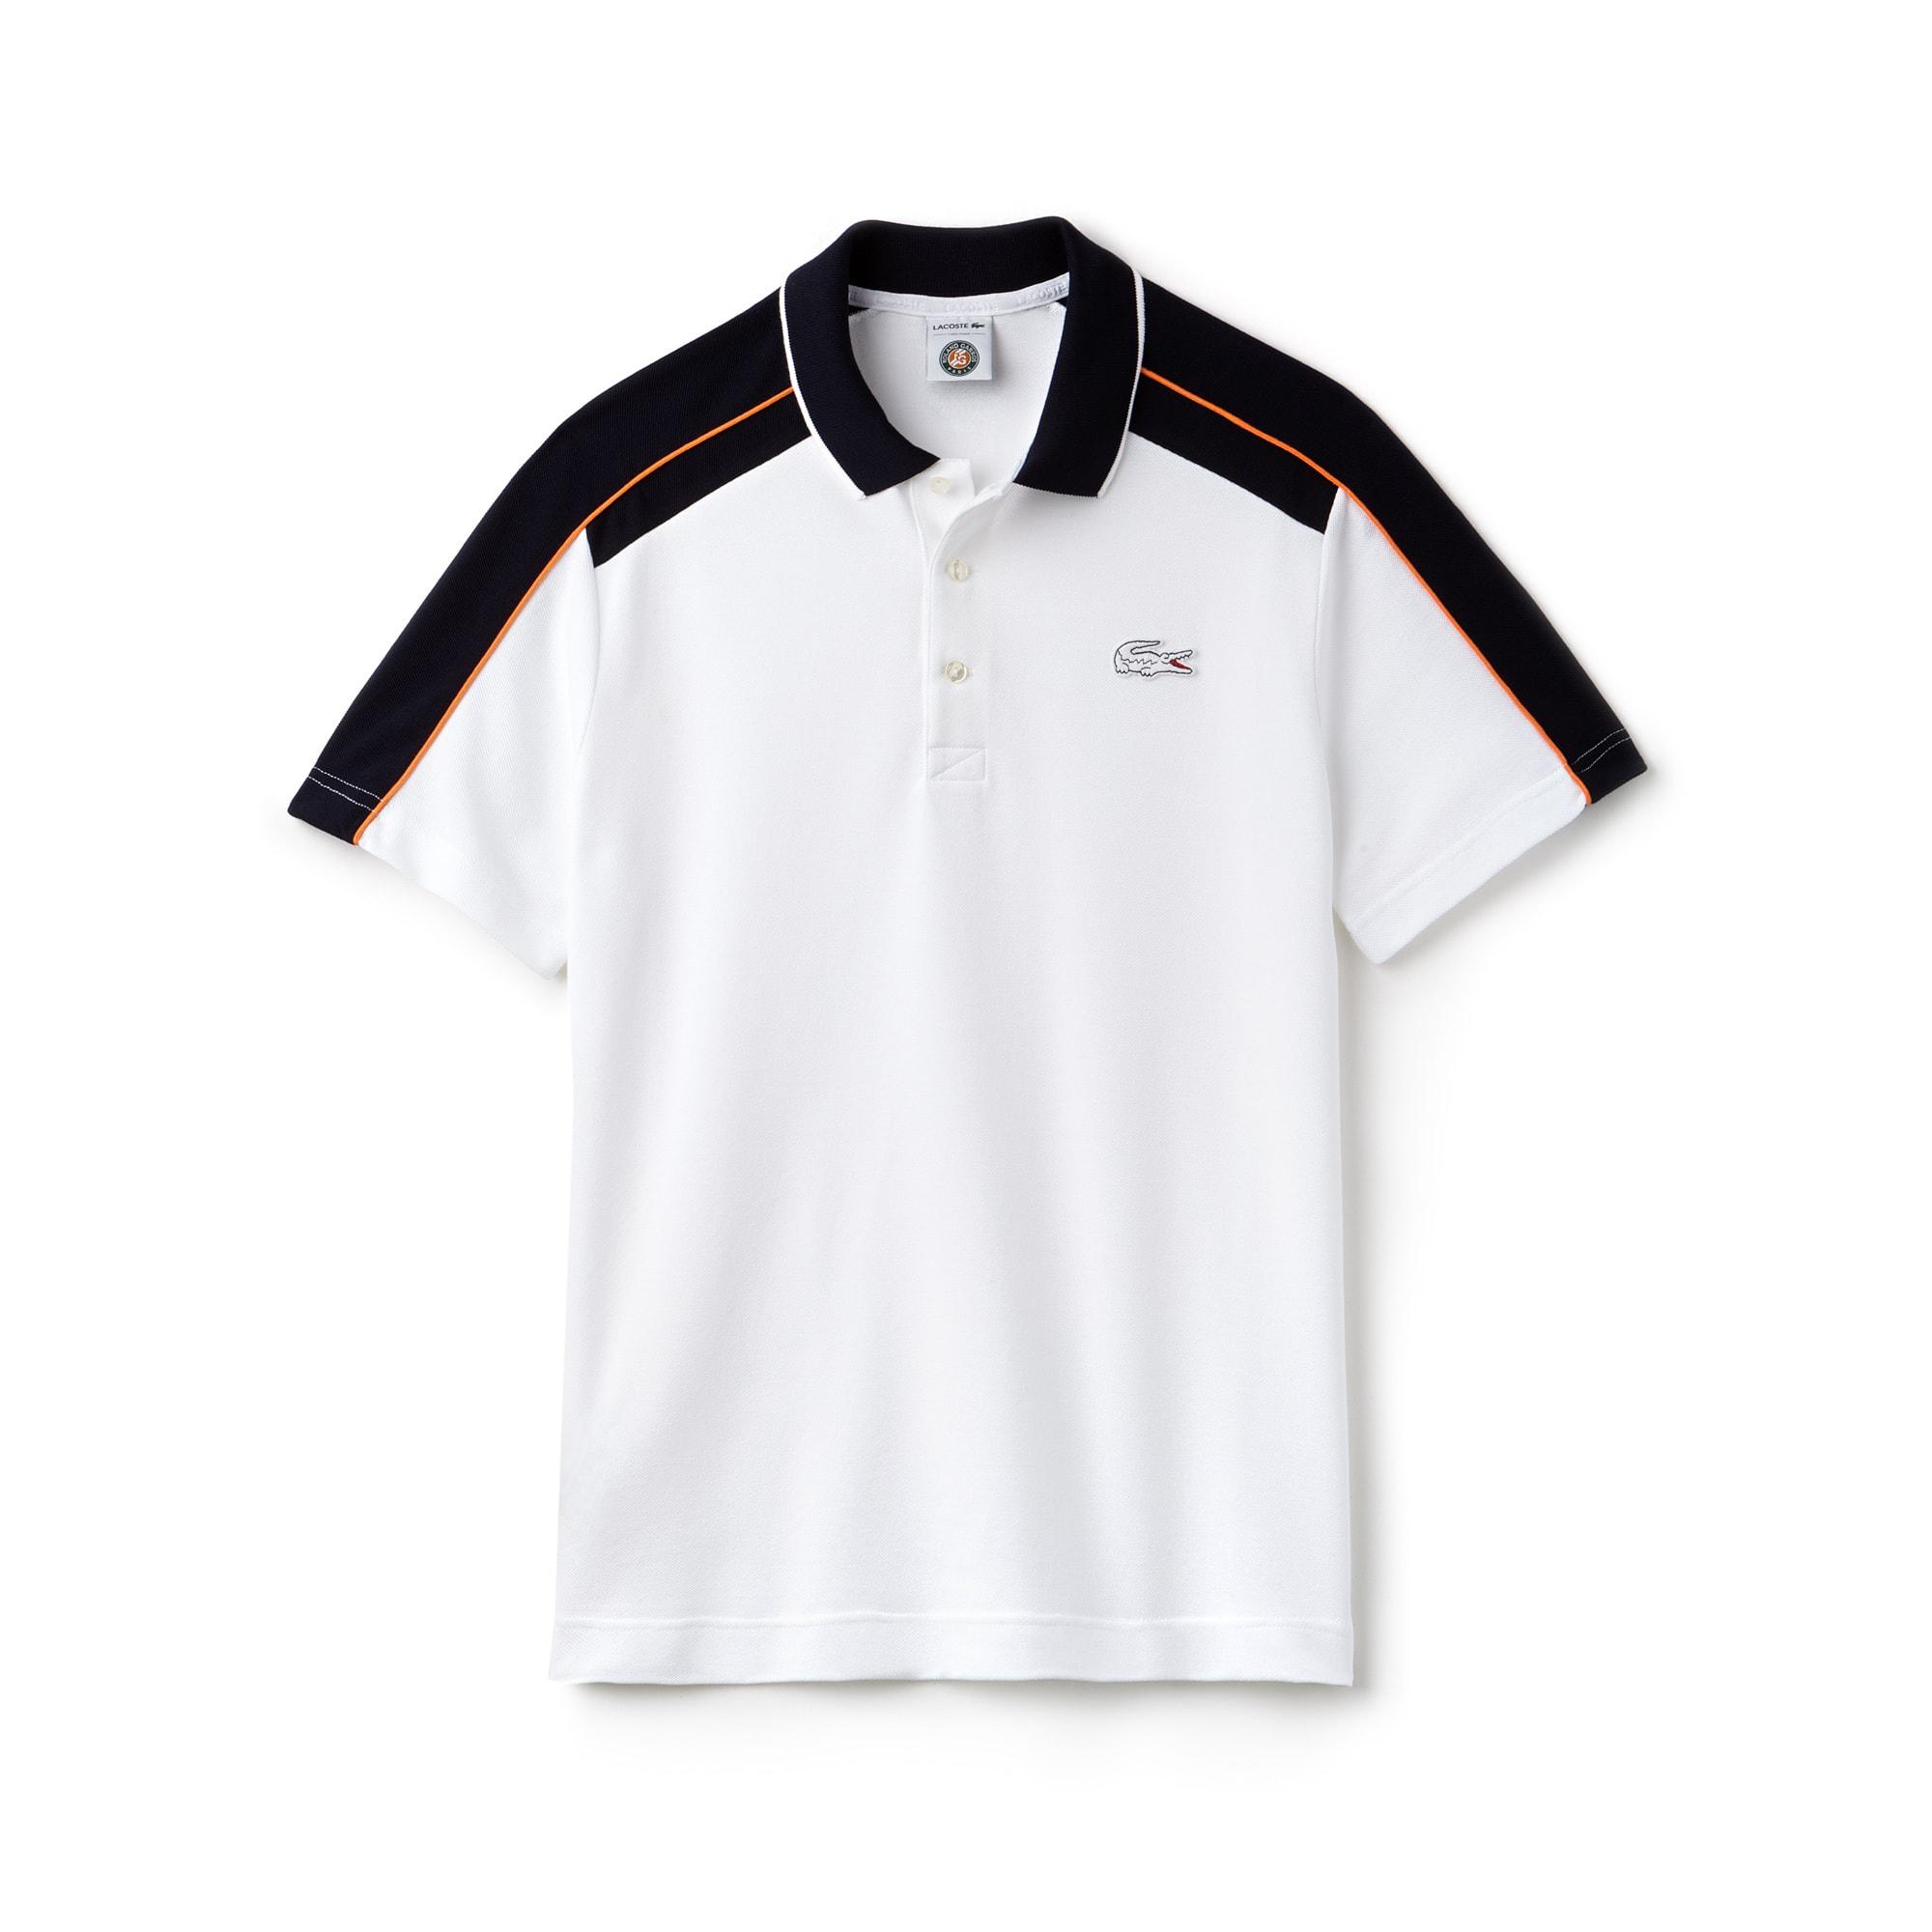 Herren-Poloshirt aus Piqué ROLAND GARROS Kollektion LACOSTE SPORT